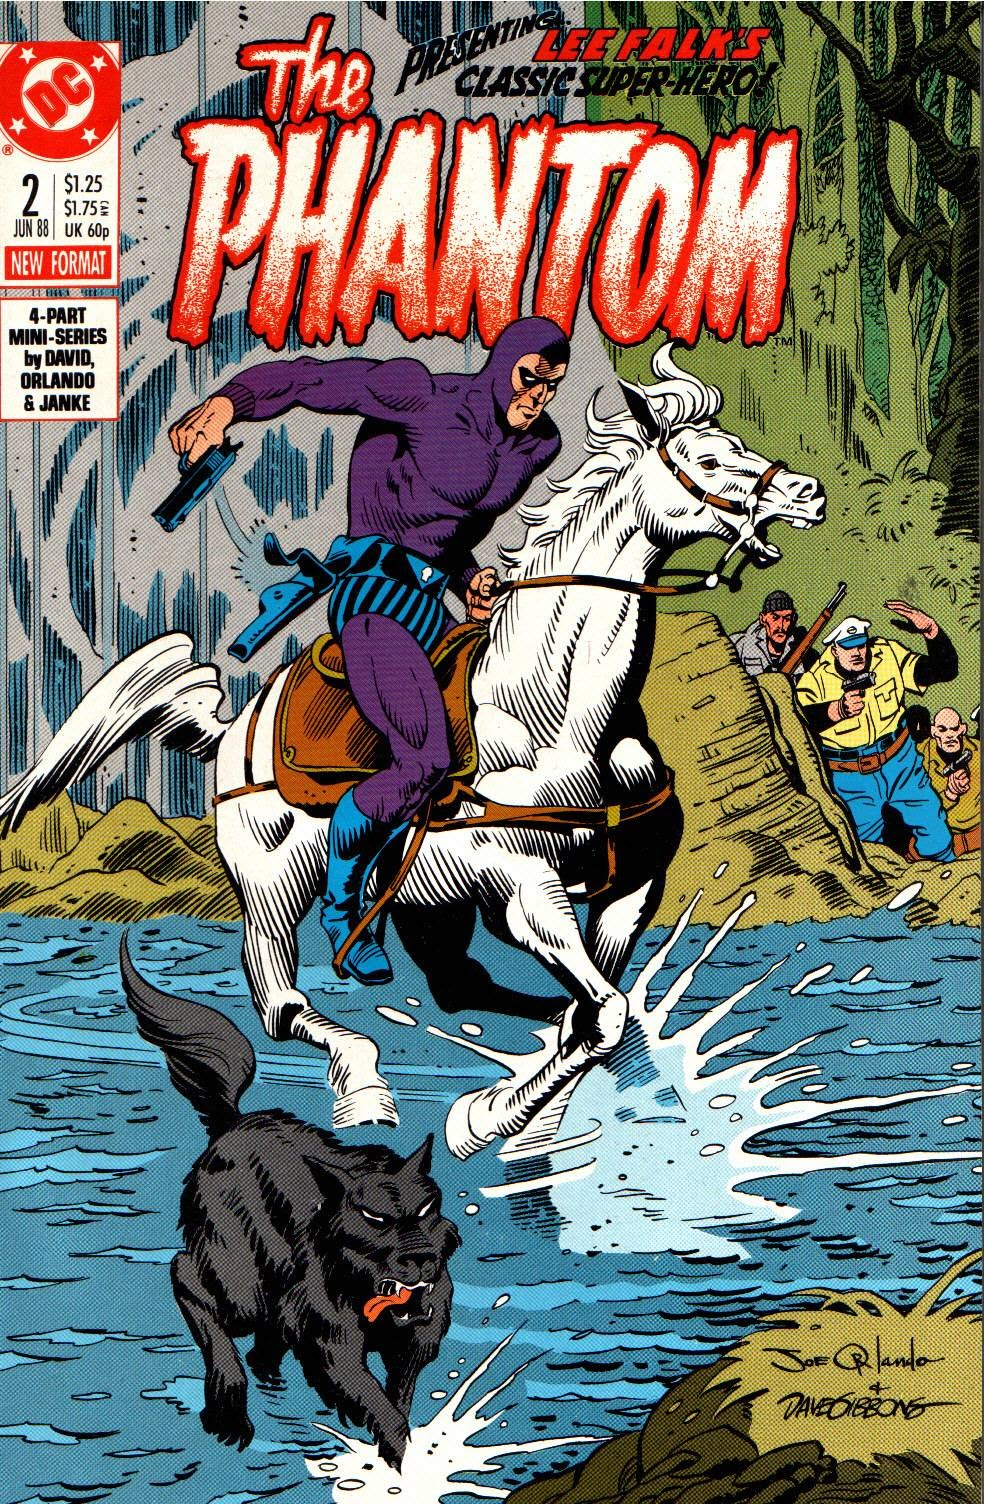 Read online The Phantom (1988) comic -  Issue #2 - 1